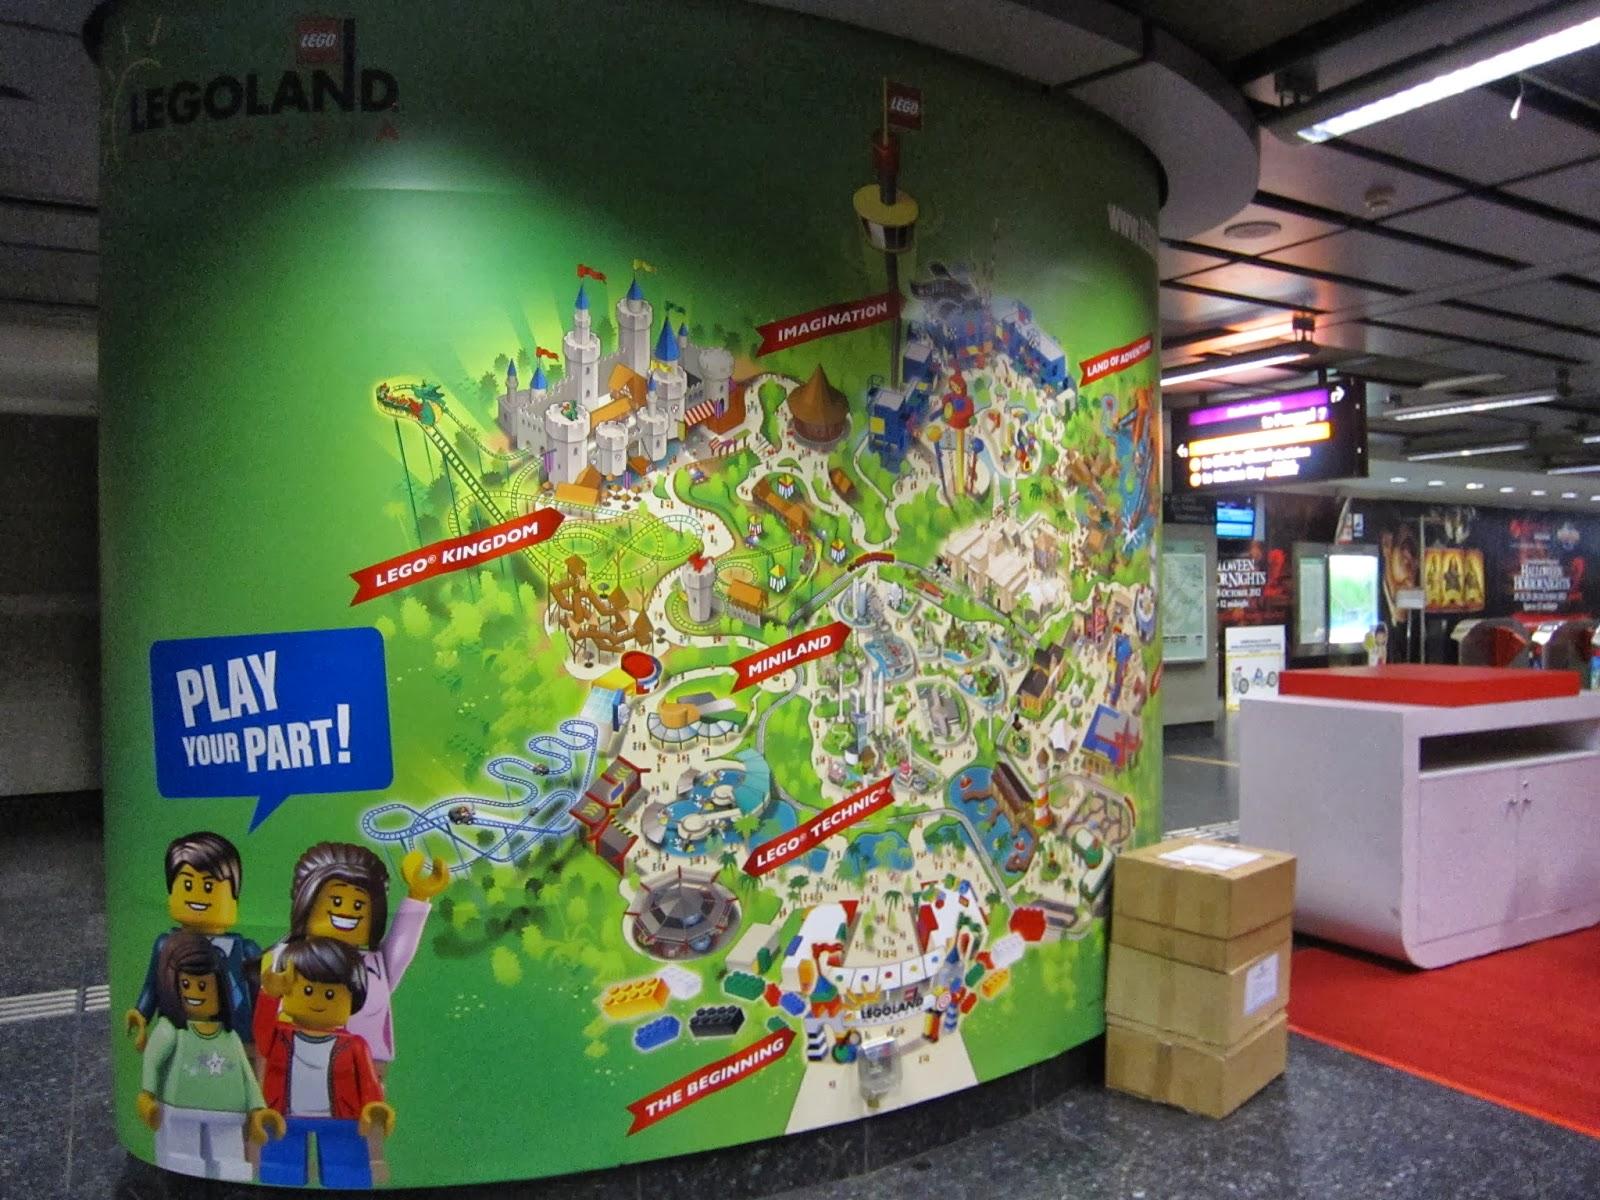 Alan 's 遊記部部樂: 星馬 Legoland 之旅 Day 4 (新加坡-濱海灣花園-魚尾獅公園)